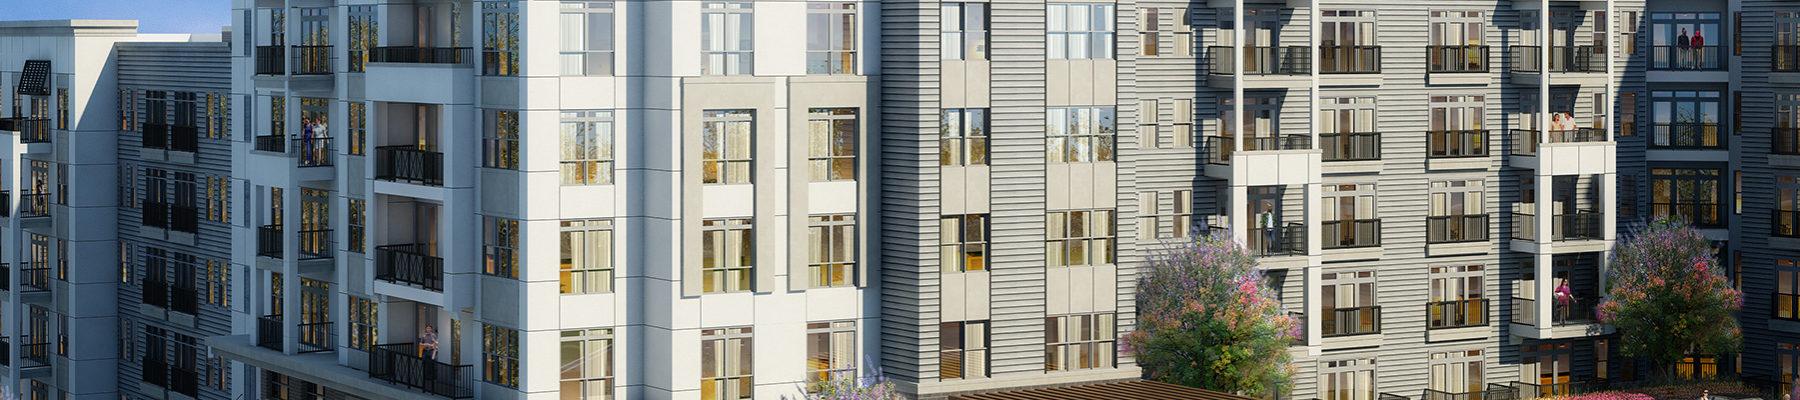 Vine North Hills Apartments